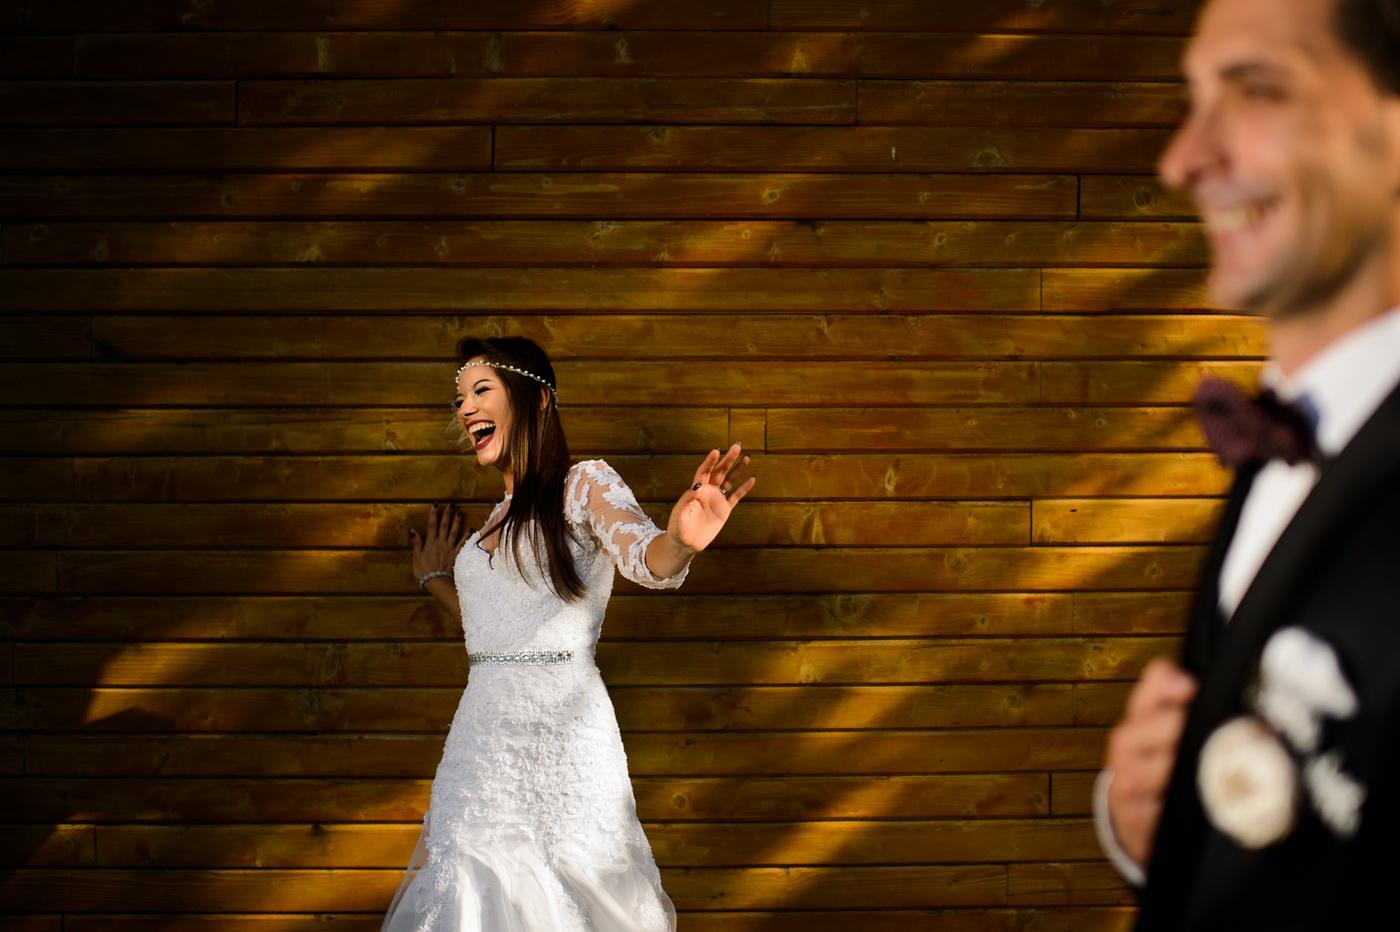 Destination Wedding Photographer_Marian Sterea_099.jpg